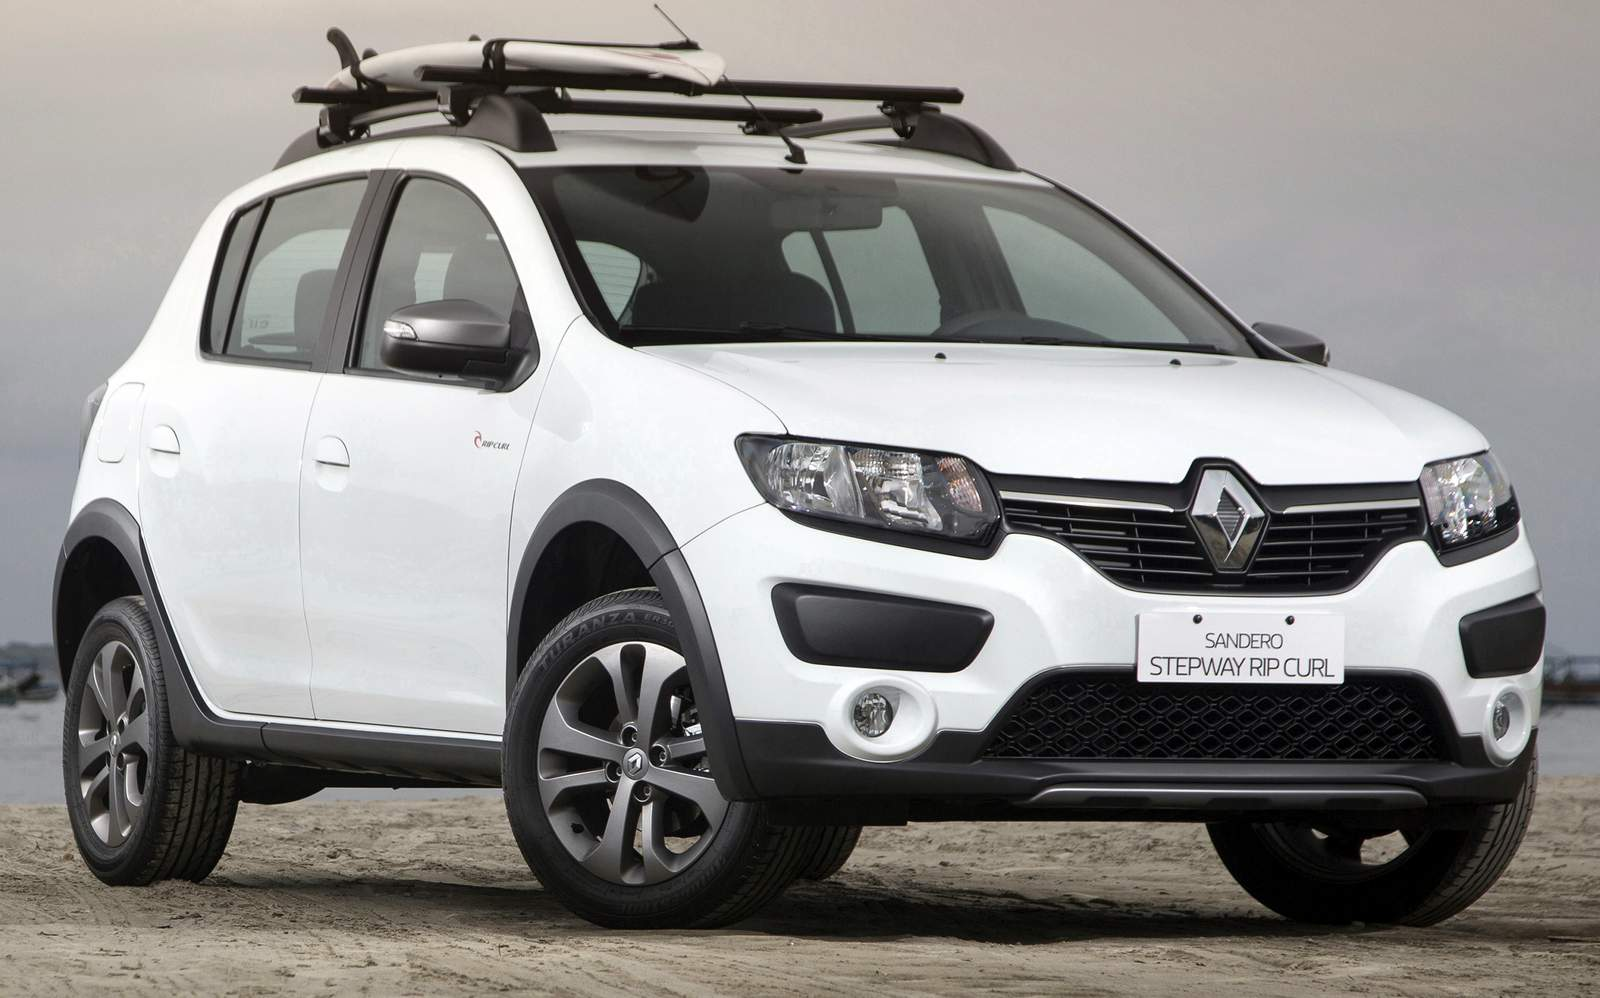 Renault Sandero Stepway Ripcurl 5